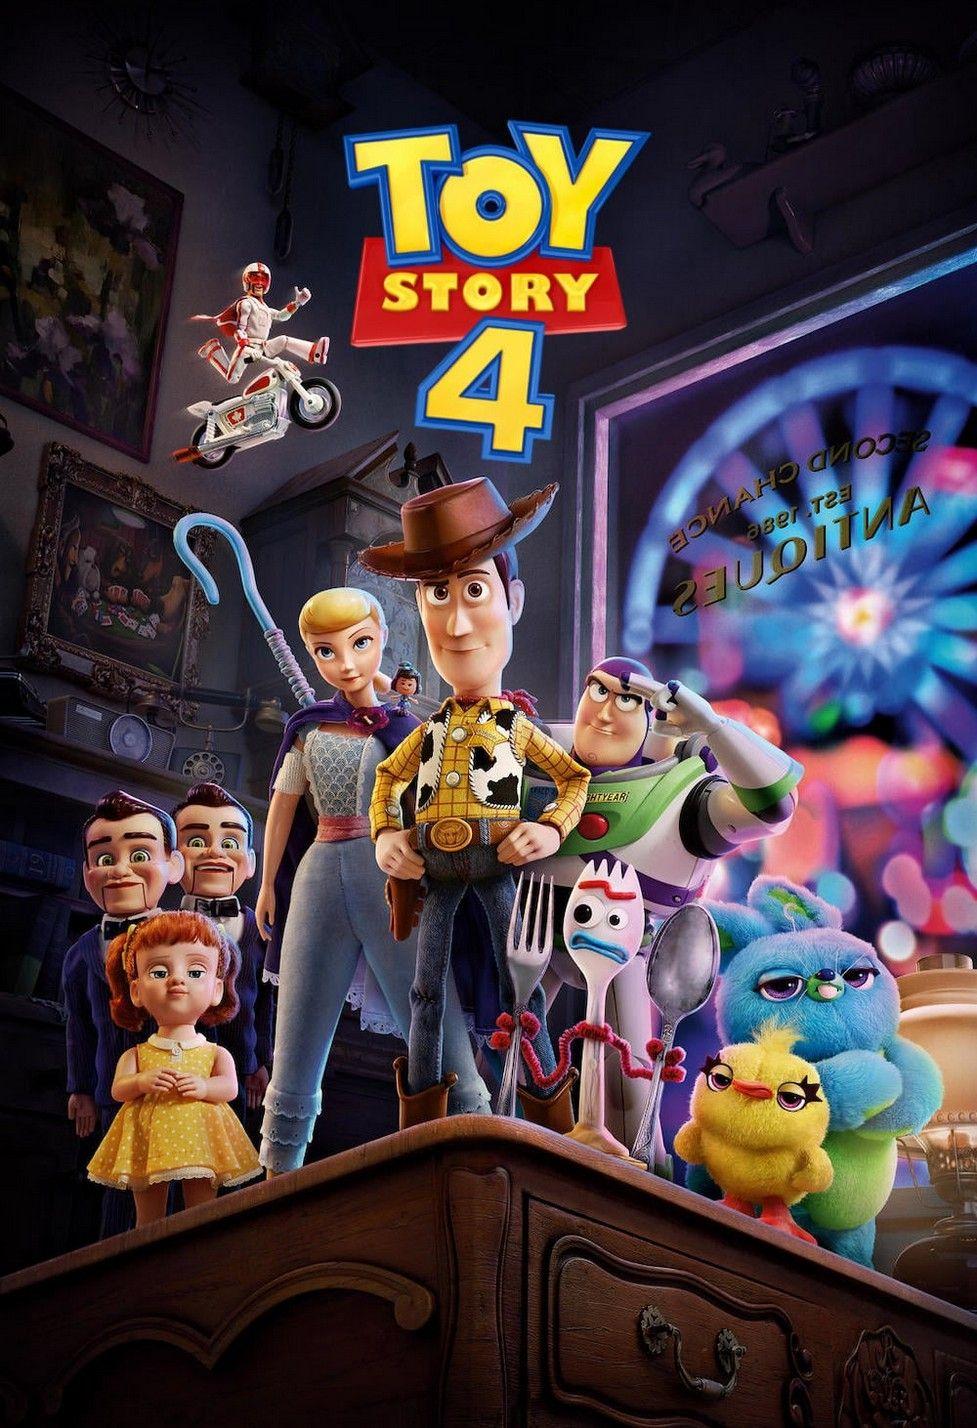 Toy Story 4 Pelicula Full Hd Descargar Pelicula Toy Story Peliculas Completas Peliculas De Disney